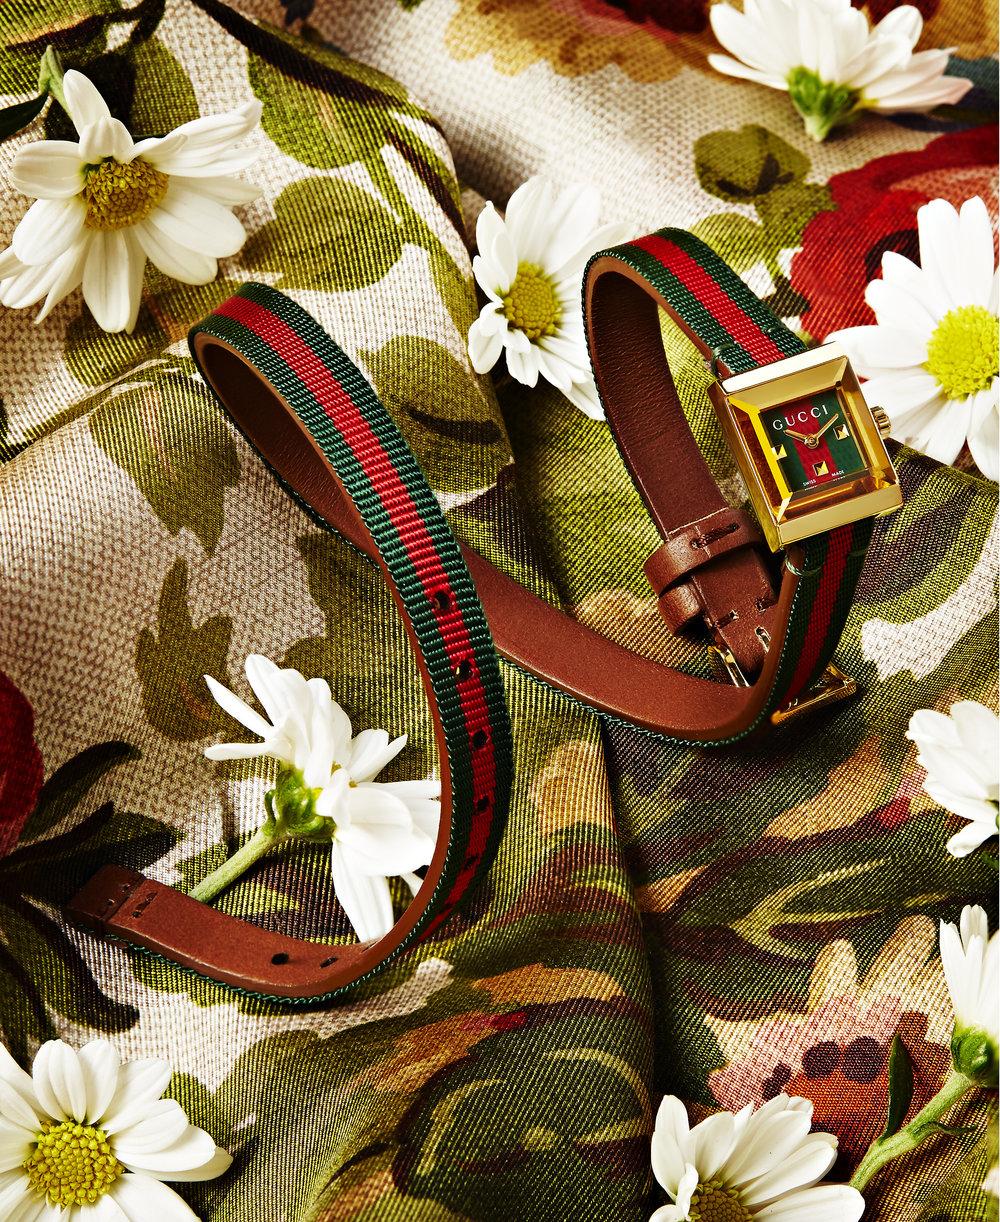 15_Gucci_Flowers_CU.jpg